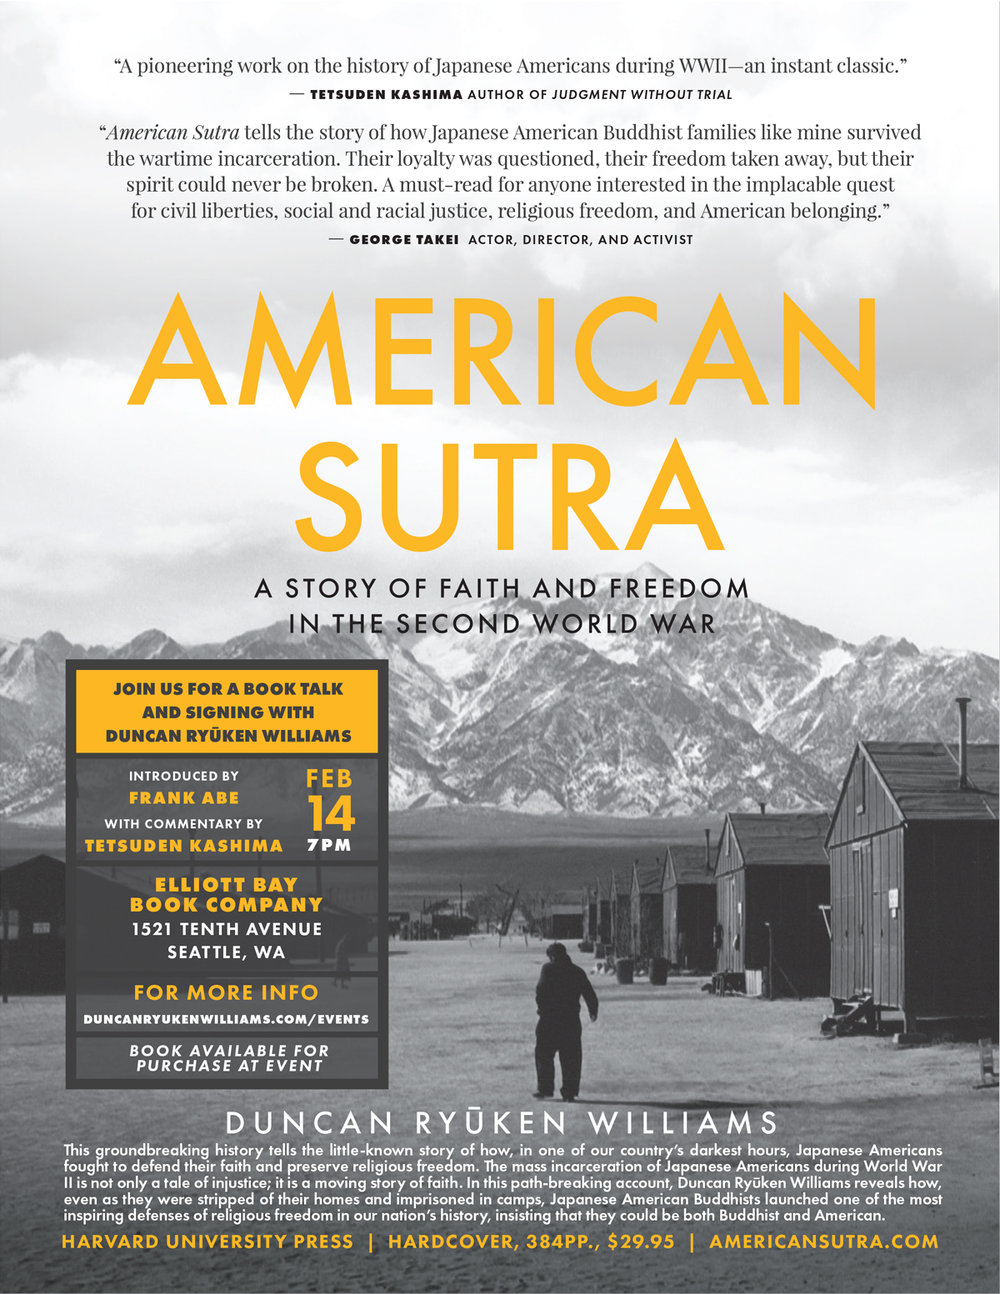 AmericanSutra-Flyer-V1-011019-SeattleV2.jpg